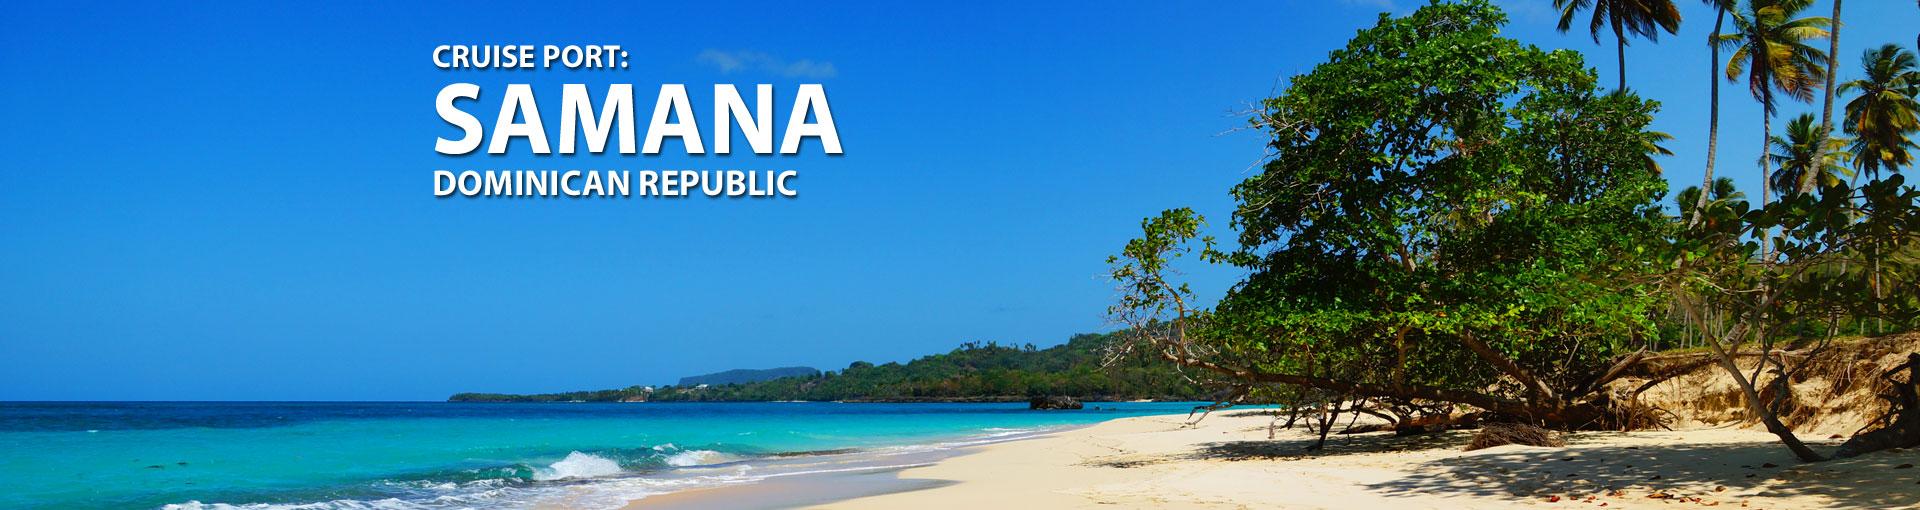 Cruises to Samana, Dominican Republic